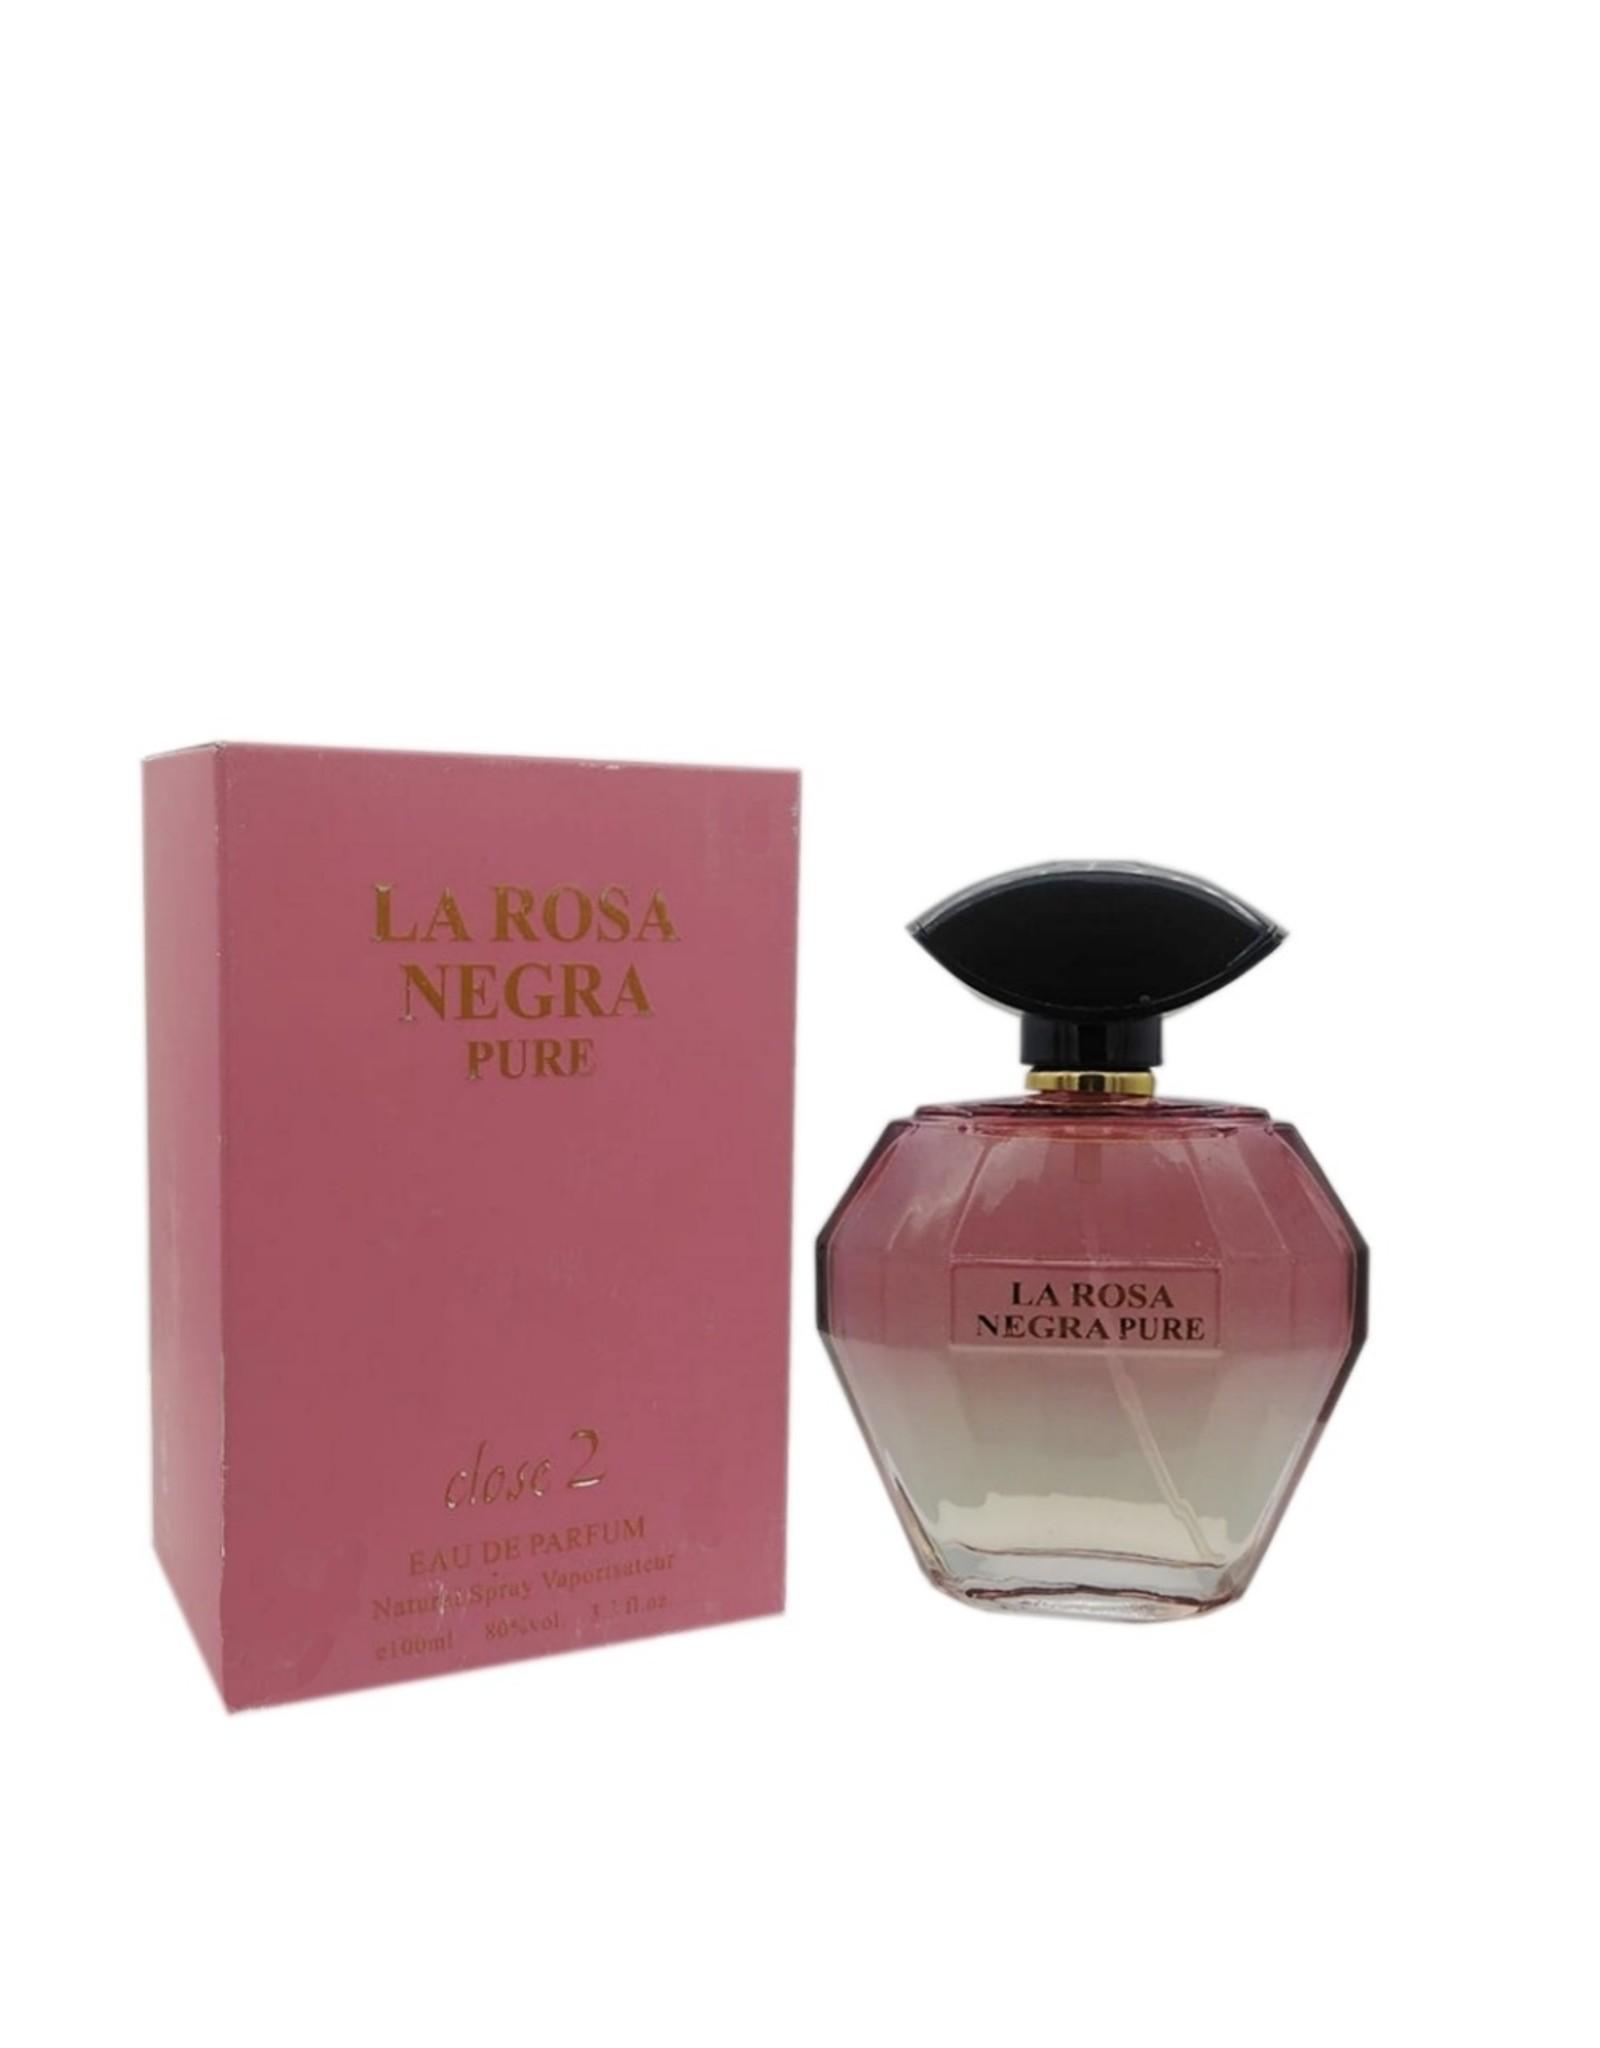 Close 2 parfums La rosa Negra pure EDP 100 ml